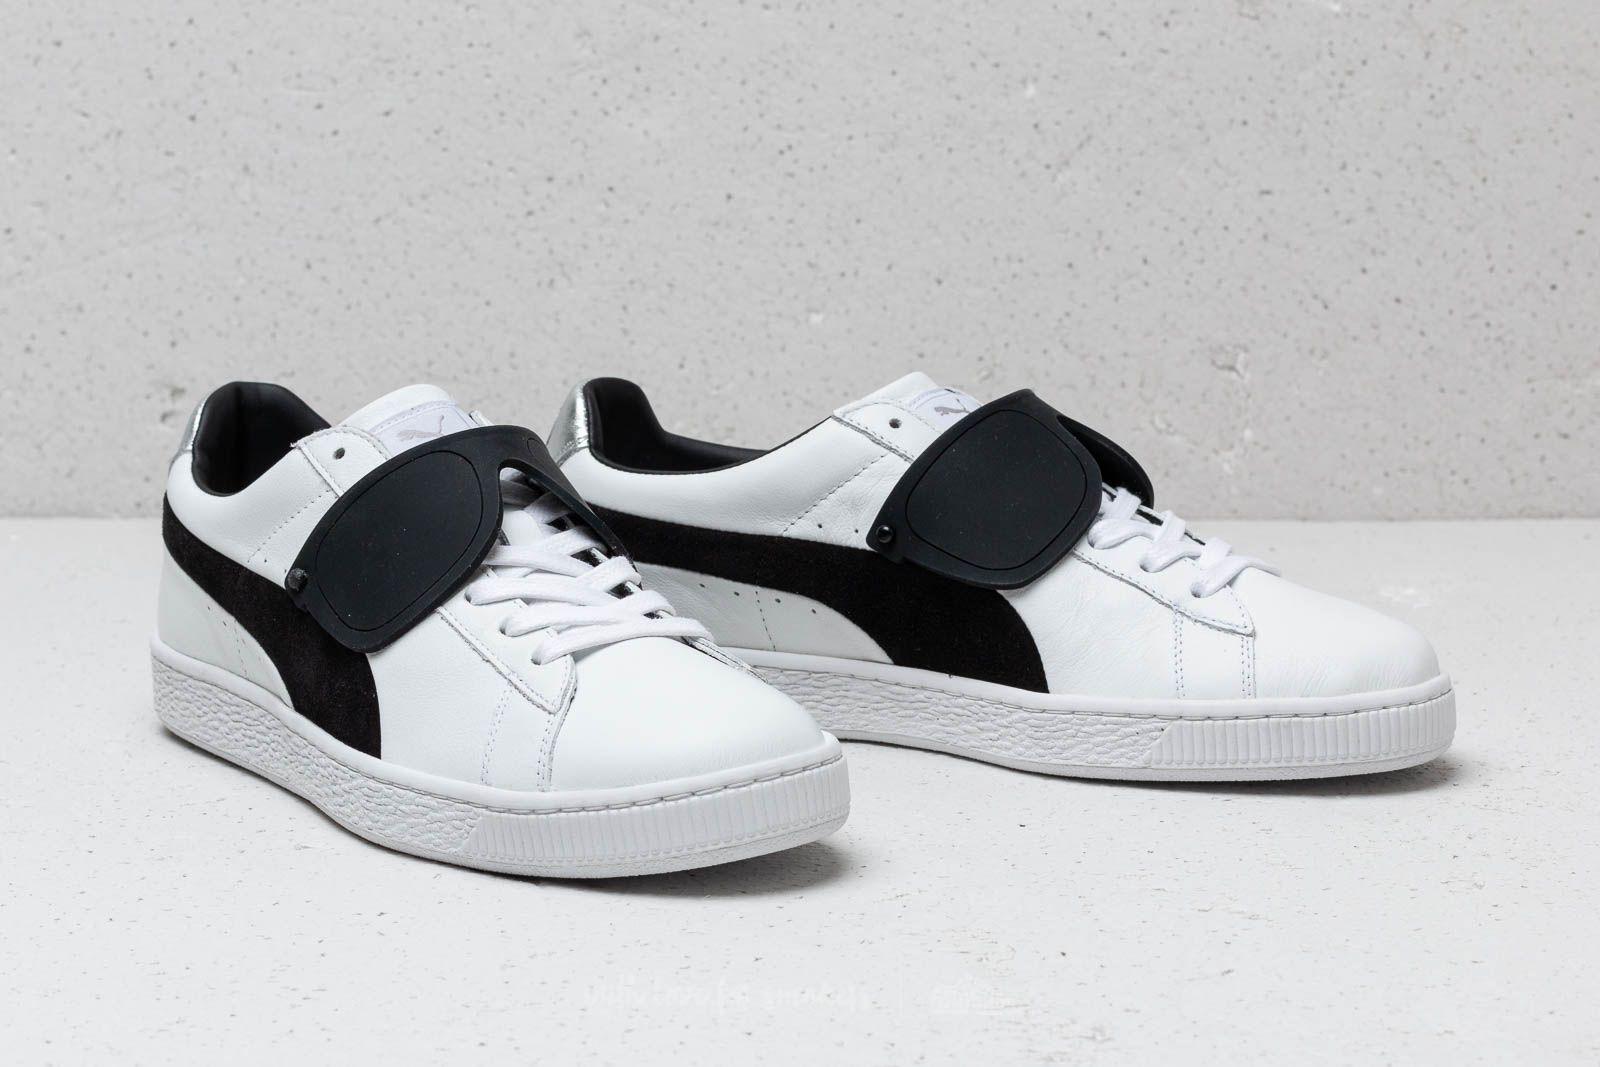 Puma Suede Classic x Karl Lagerfeld Puma White Puma Black | Footshop